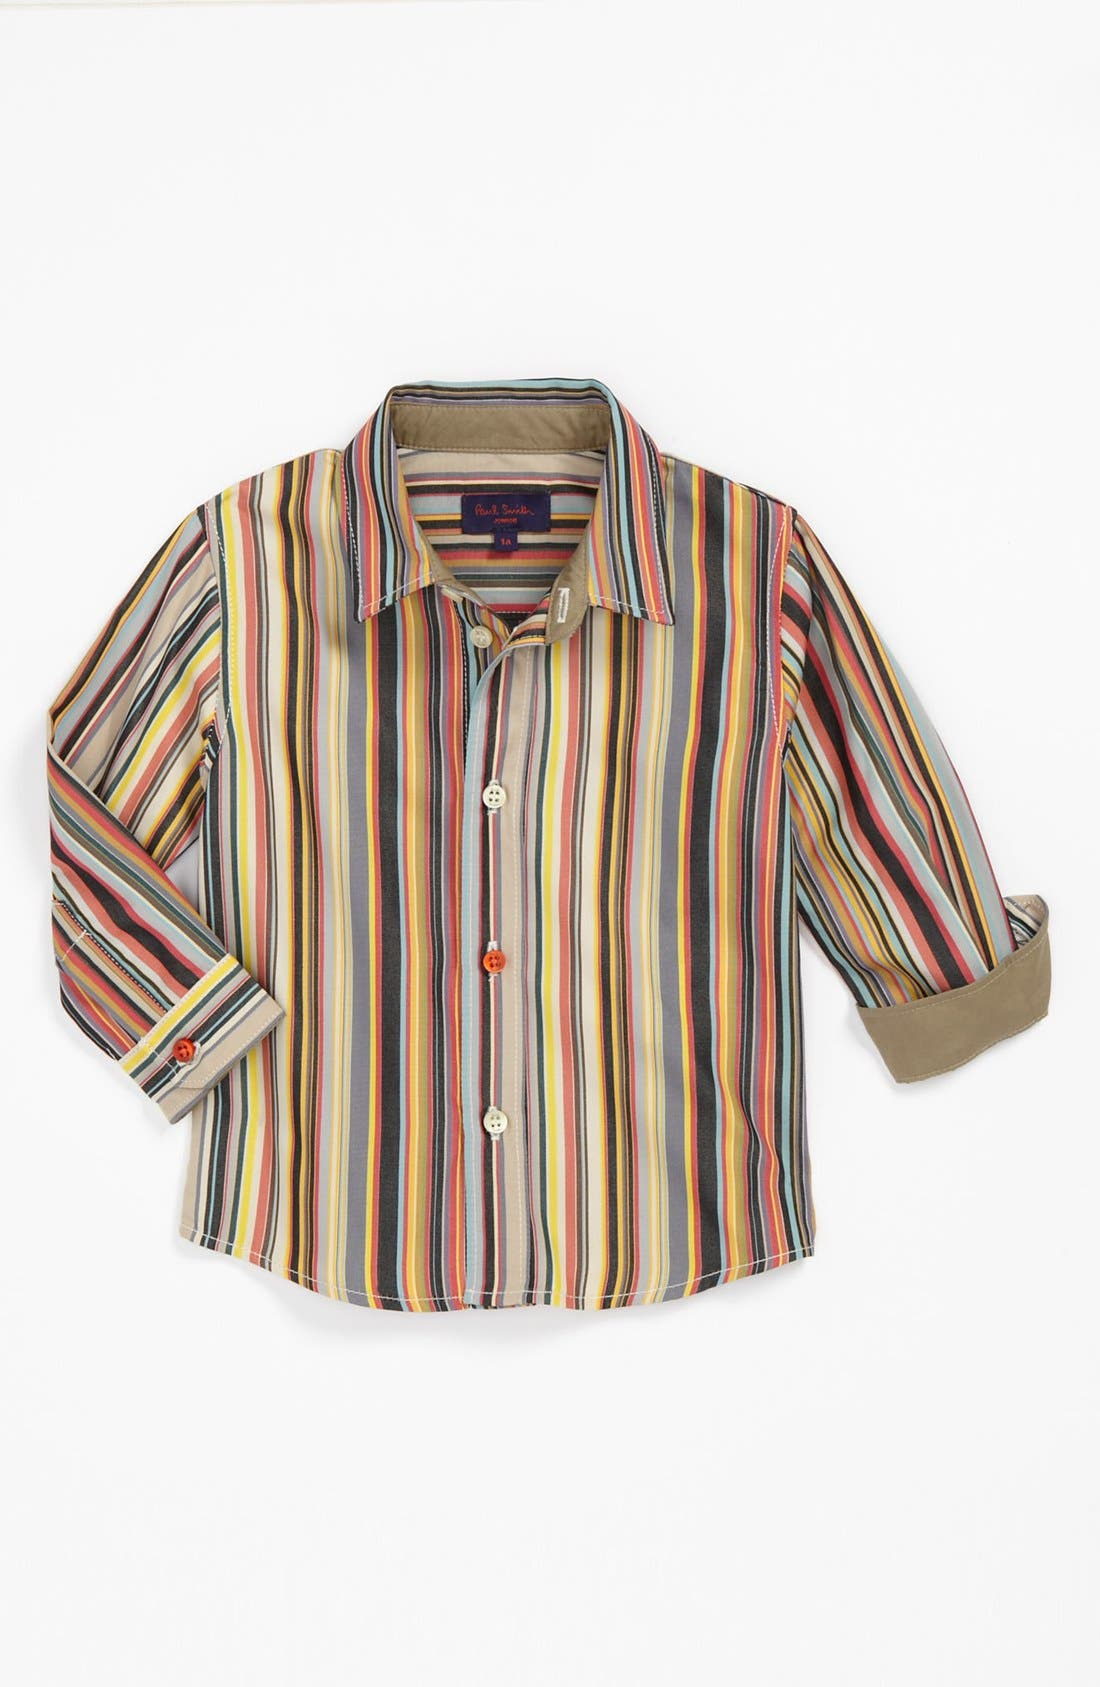 Main Image - Paul Smith Junior Woven Shirt (Toddler)